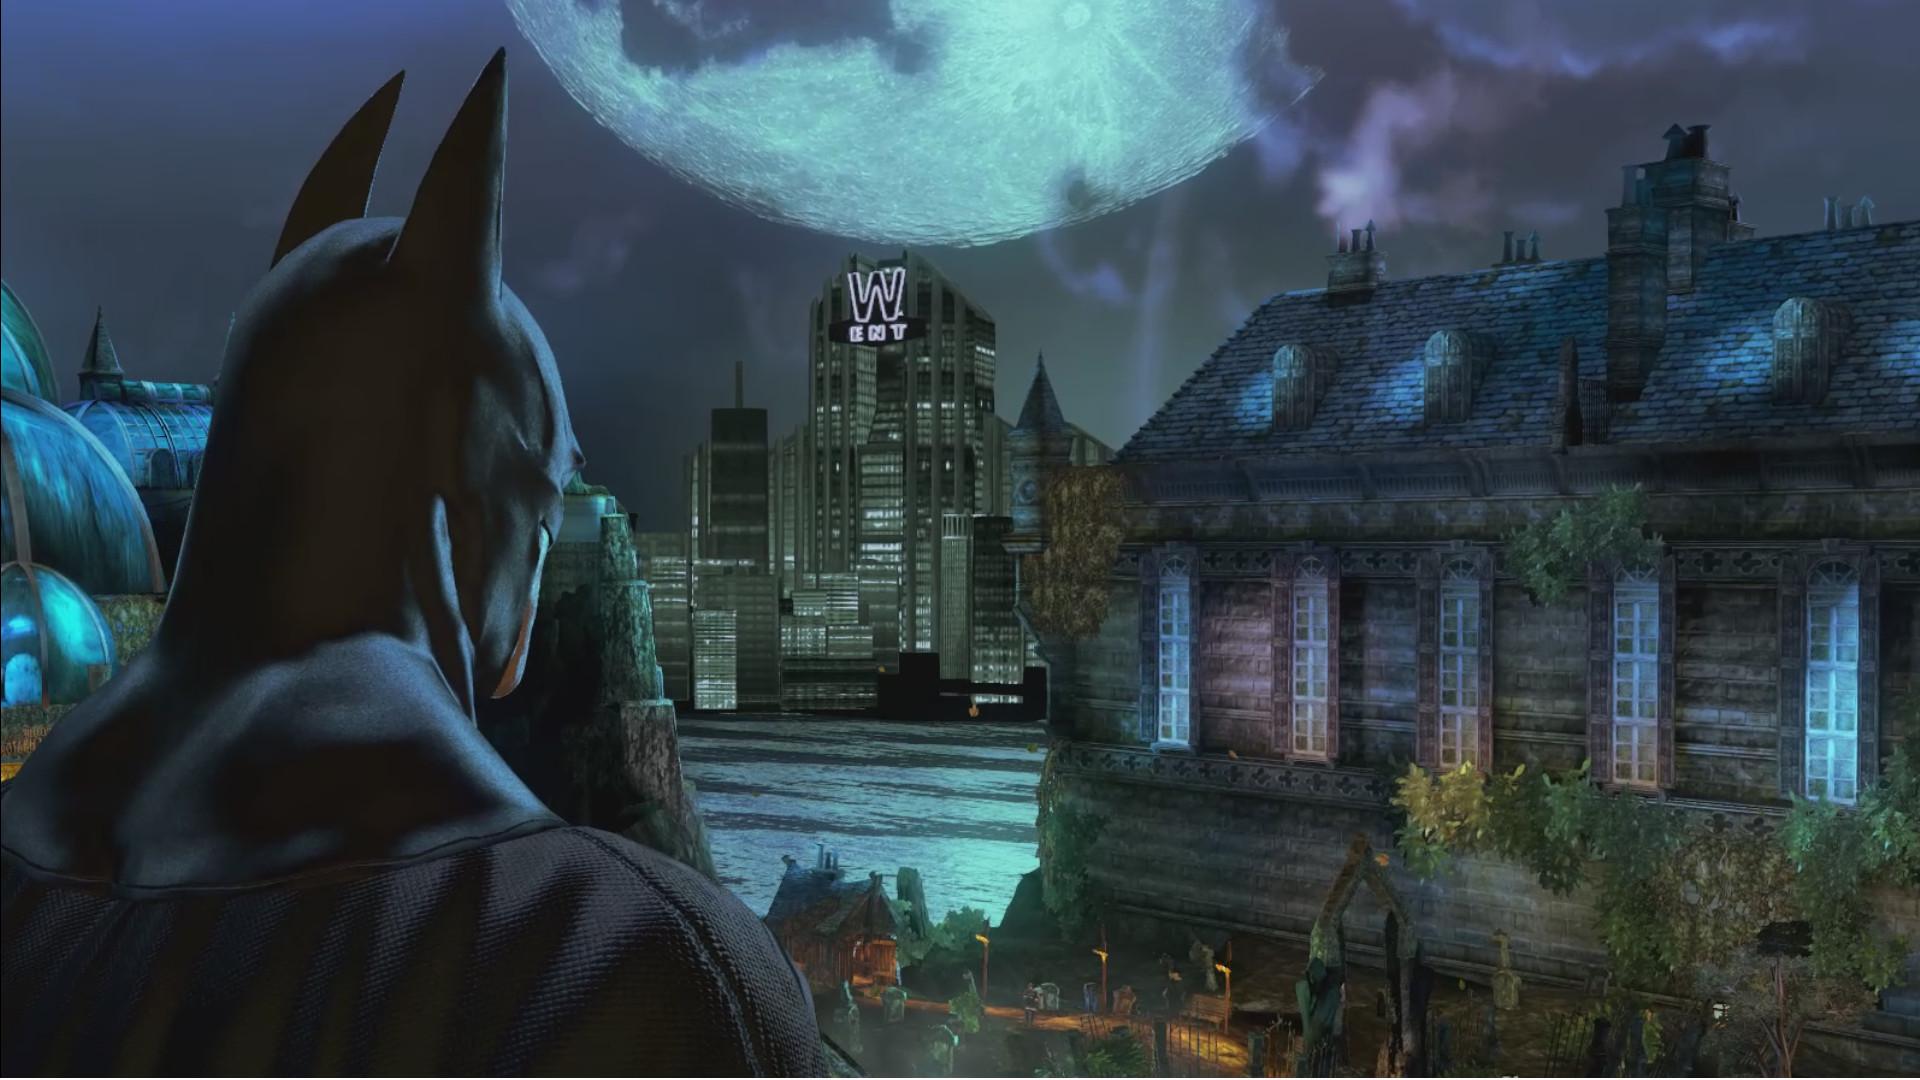 Arkham Asylum Original Vs Graphics Mod Comparison Video